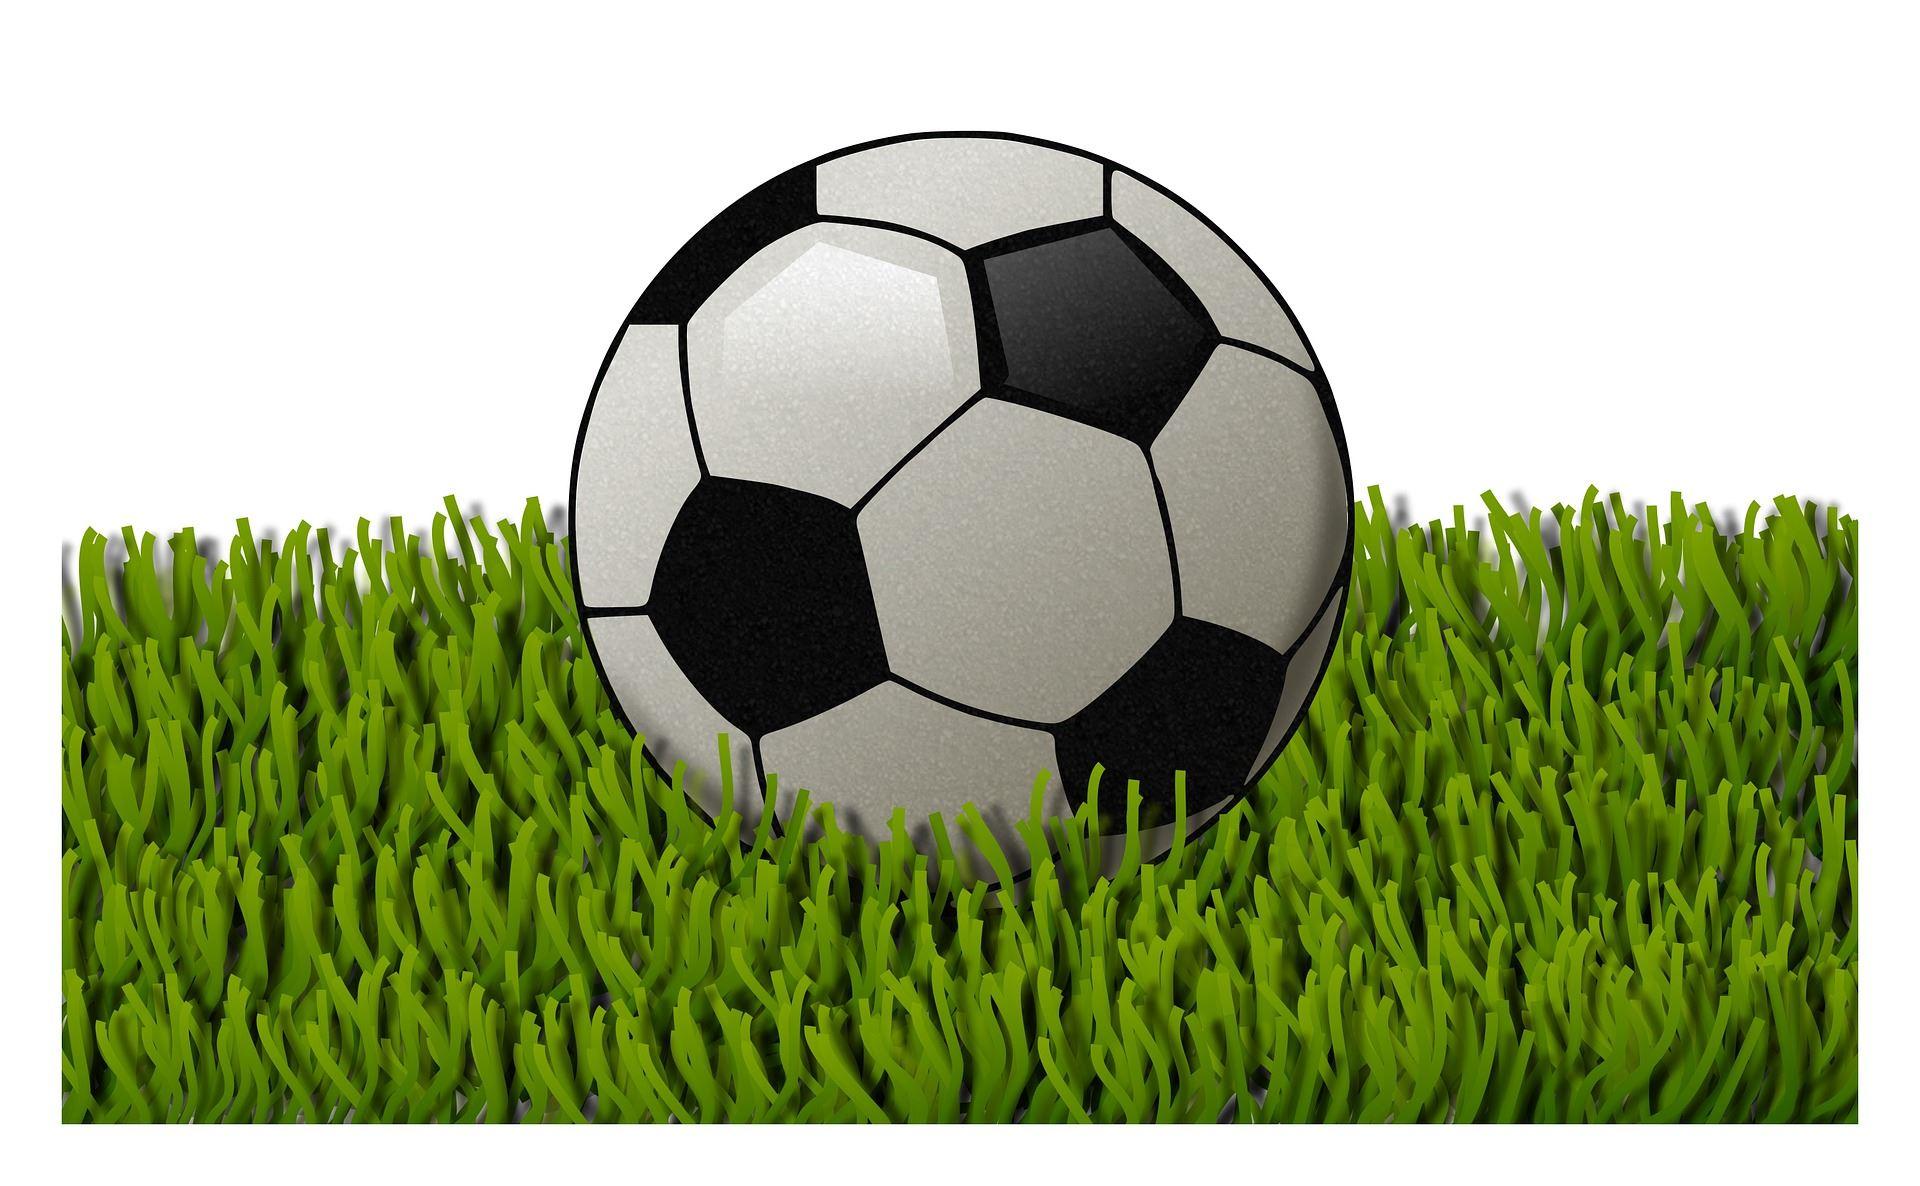 Soccer Ball and Grass